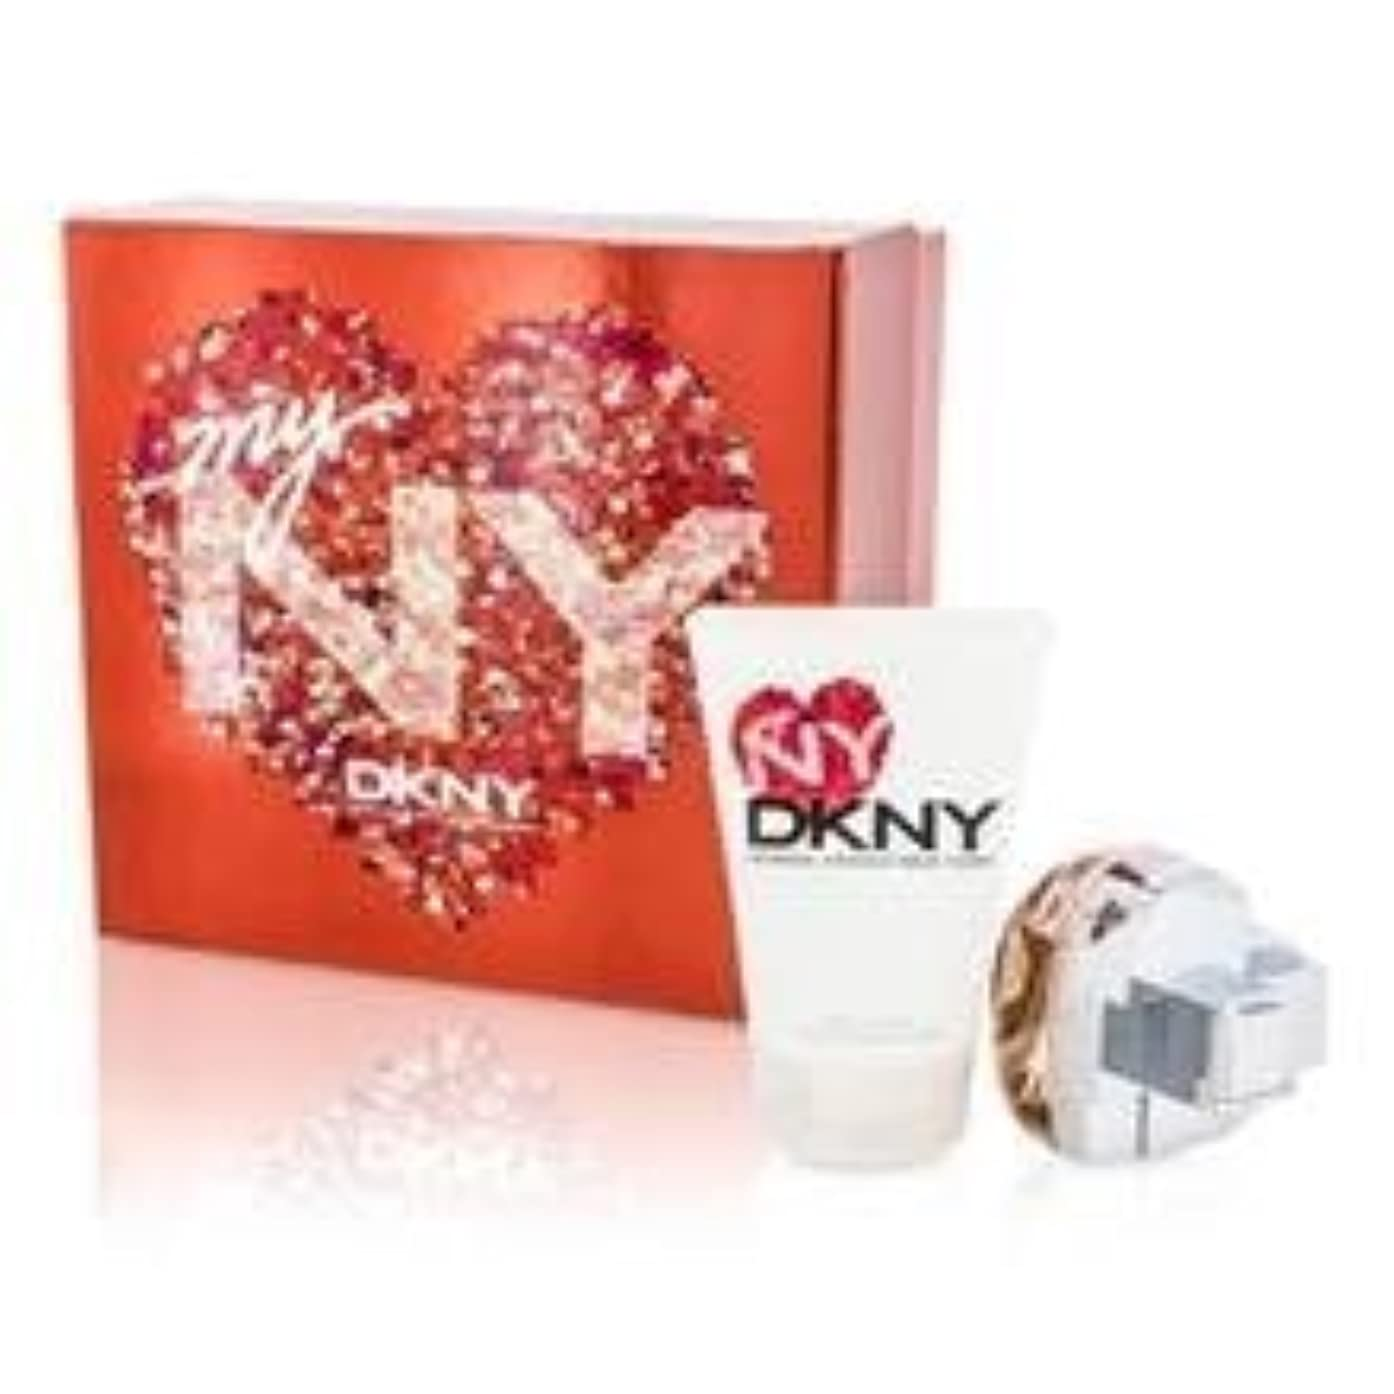 計画的資本試用DKNY My NY The Heart Of The City Coffret: Eau De Parfum Spray 50ml/1.7oz + Body Lotion 100ml/3.4oz 2pcs並行輸入品